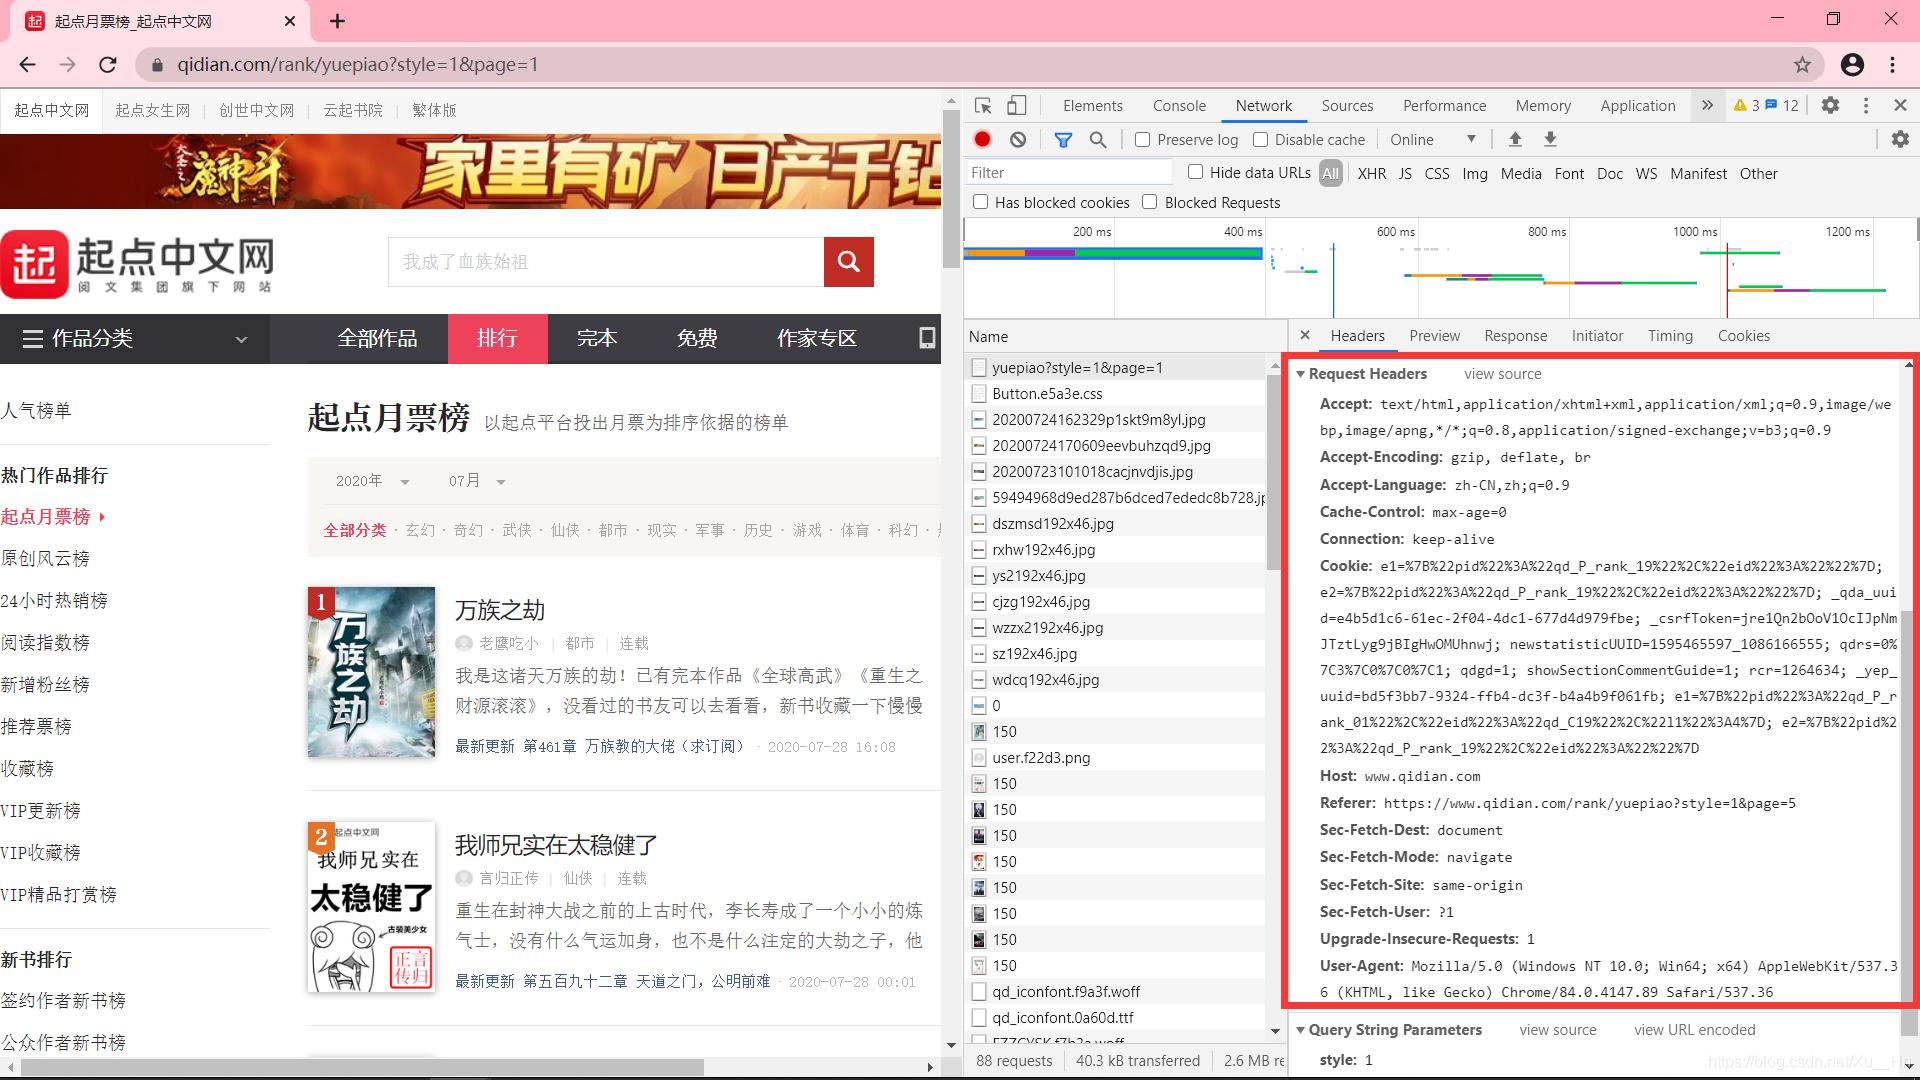 Python3网络爬虫基本操作(二):静态网页抓取XuHn的博客-novel = each.h4.a.text.strip()